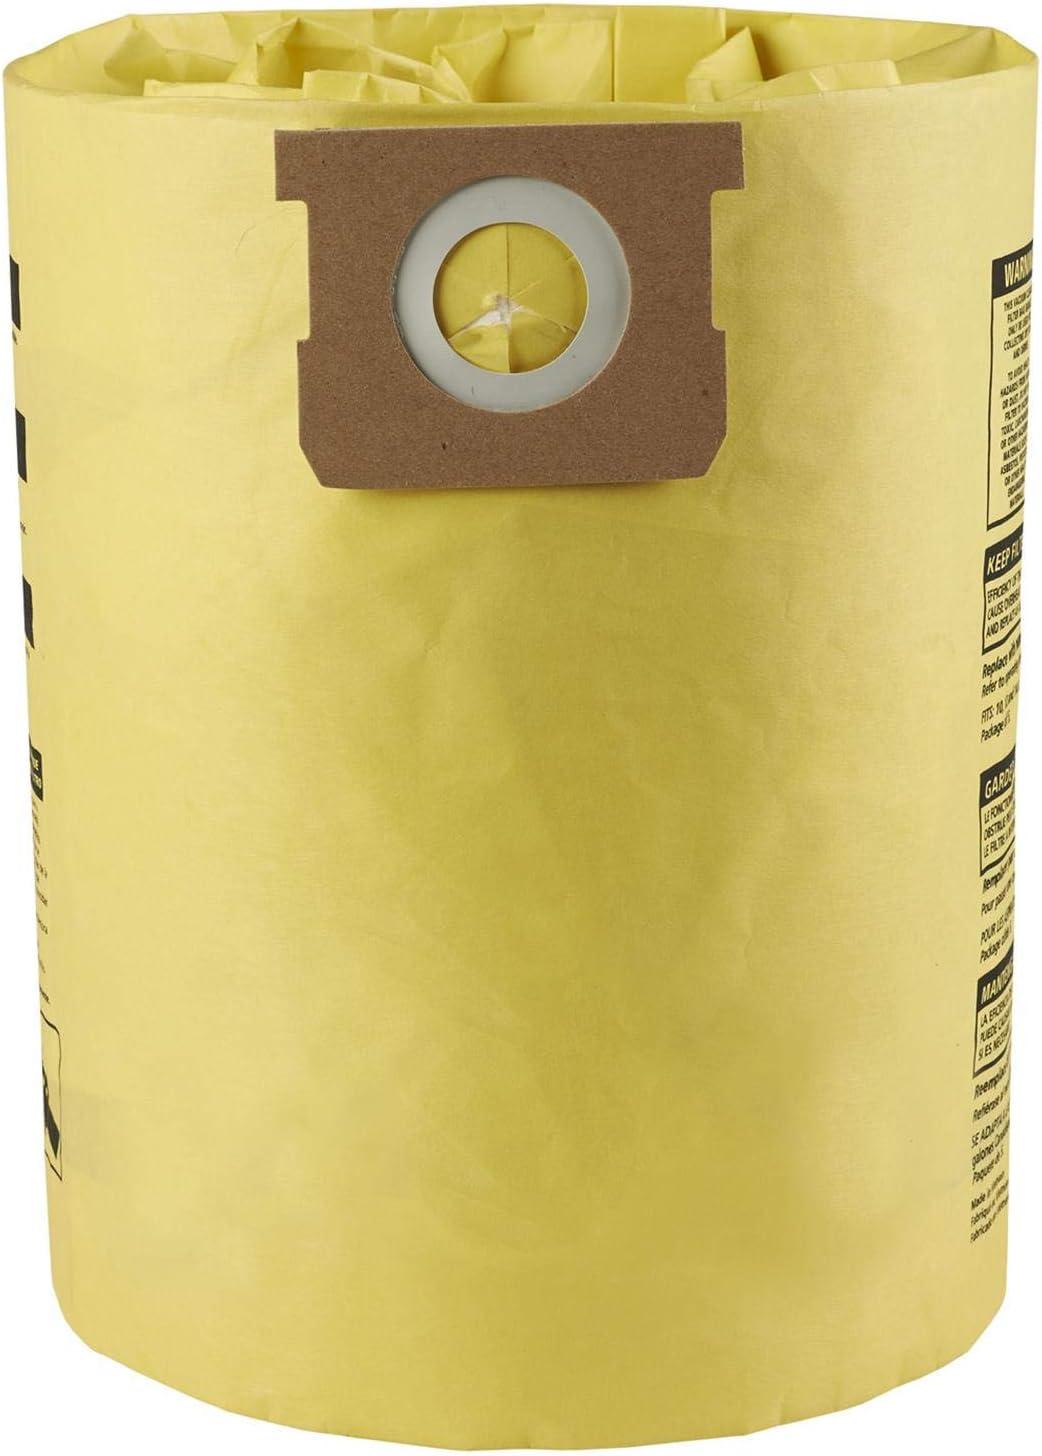 SHOP VAC CORPORATION Vacuum DISP Bags 2PK